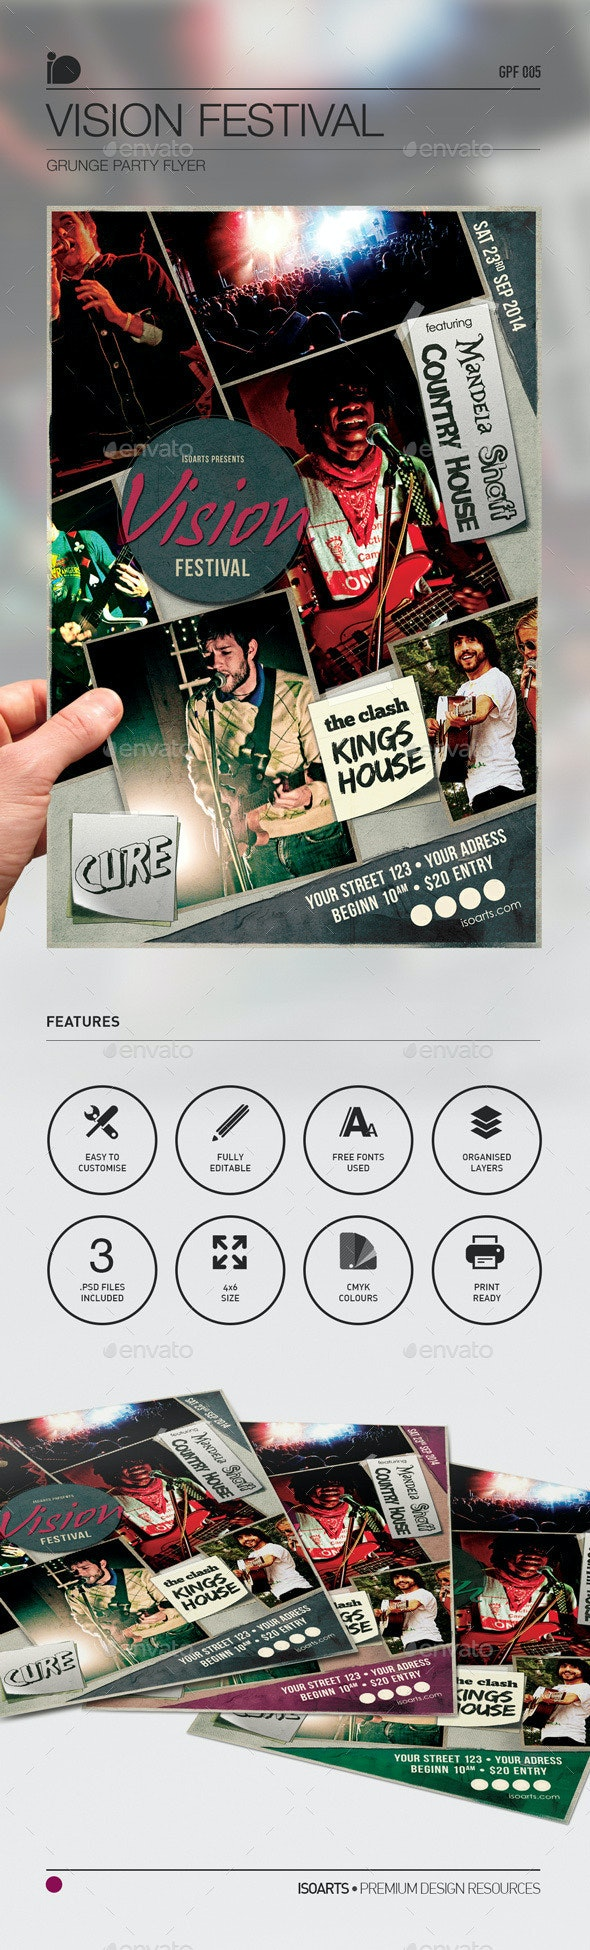 Grunge Party Flyer • Vision Festival - Concerts Events